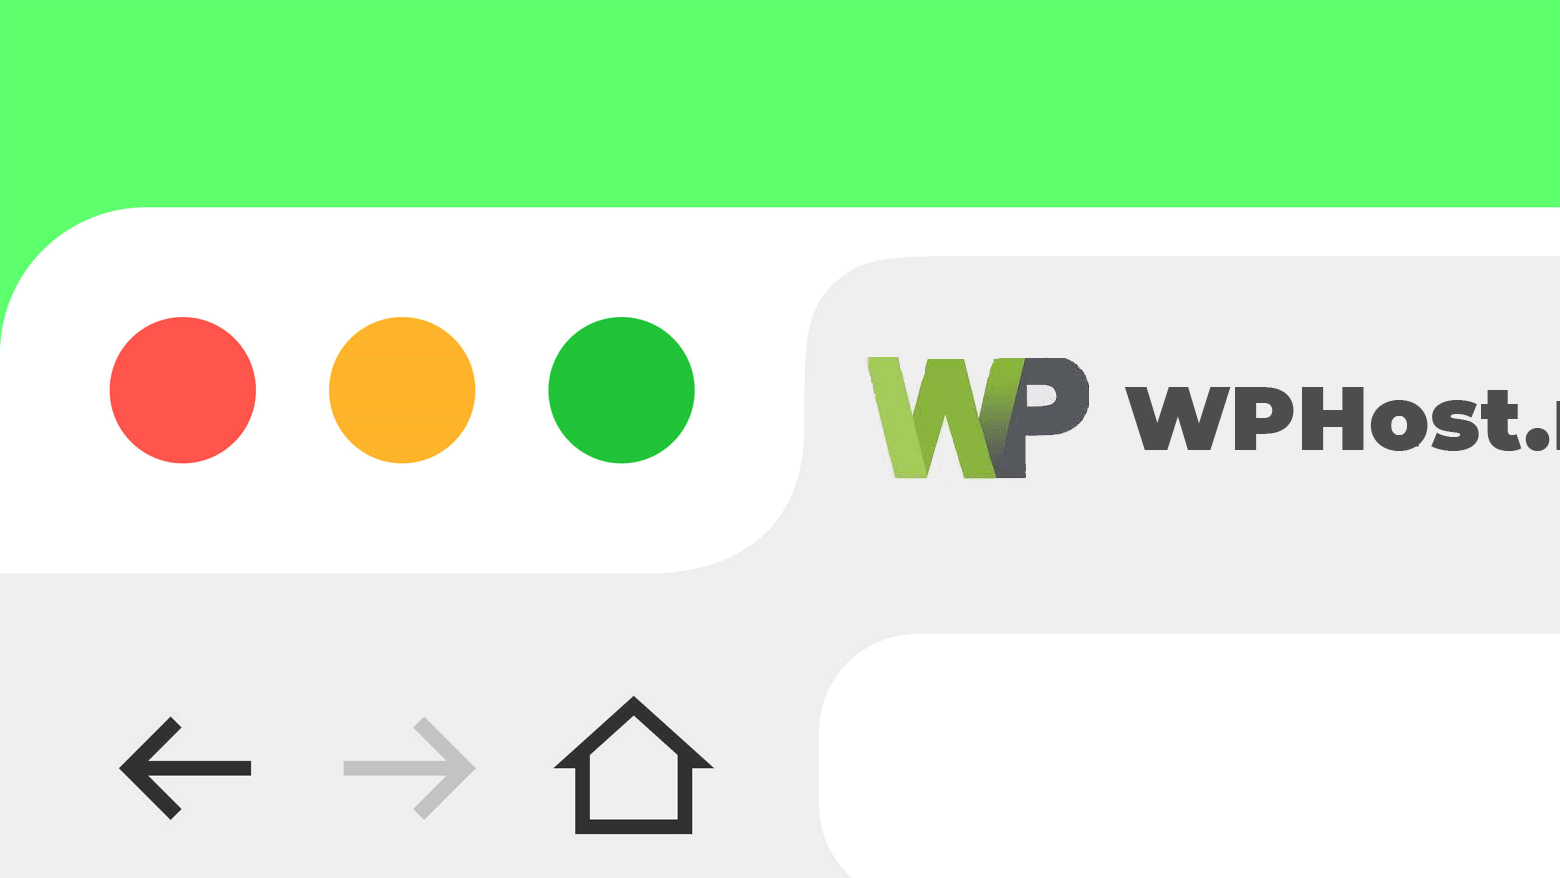 Як додати favicon у WordPress